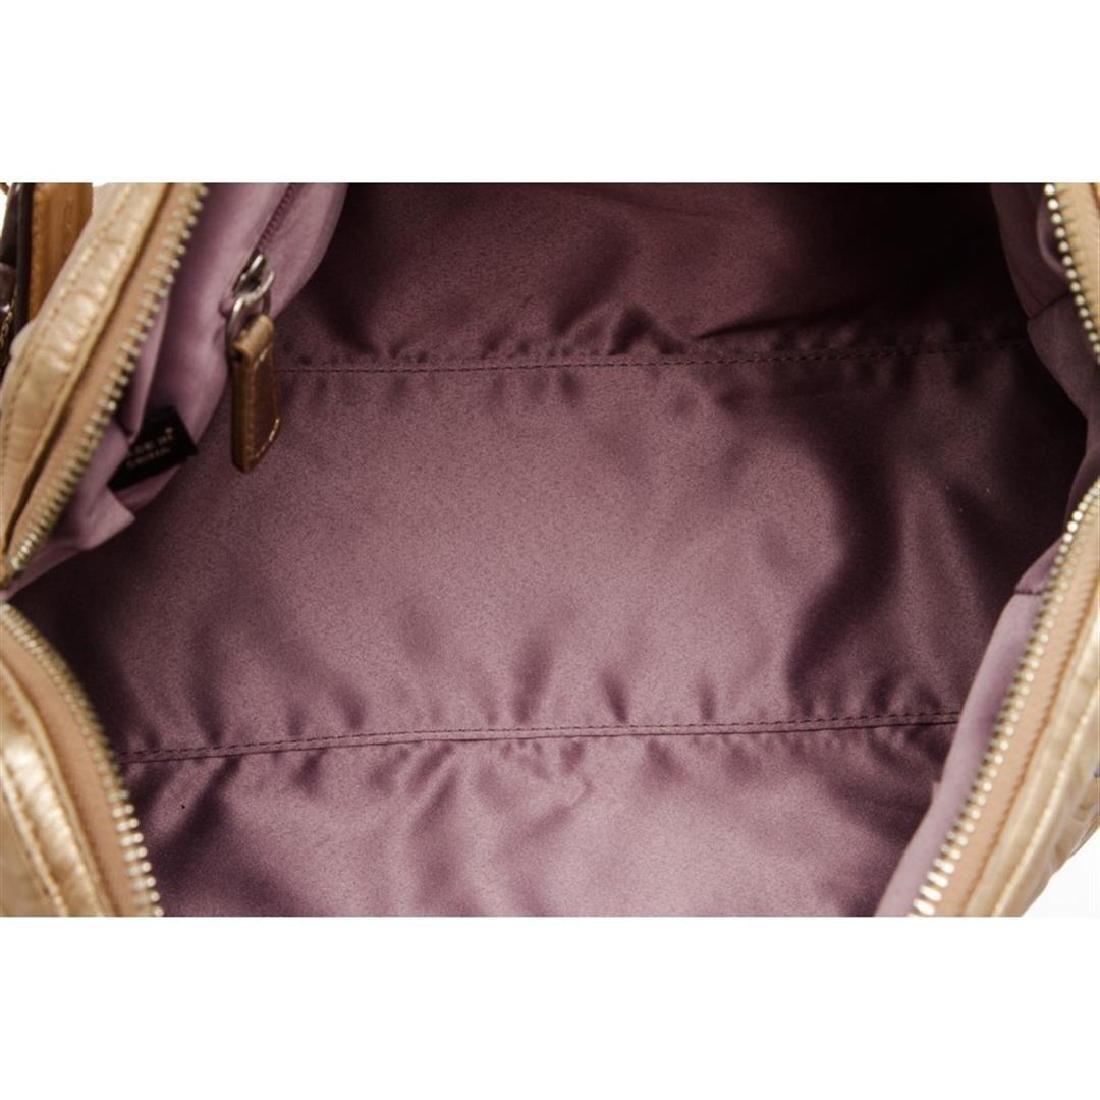 Coach Metallic Gold Monogram Leather Tote Bag - 7